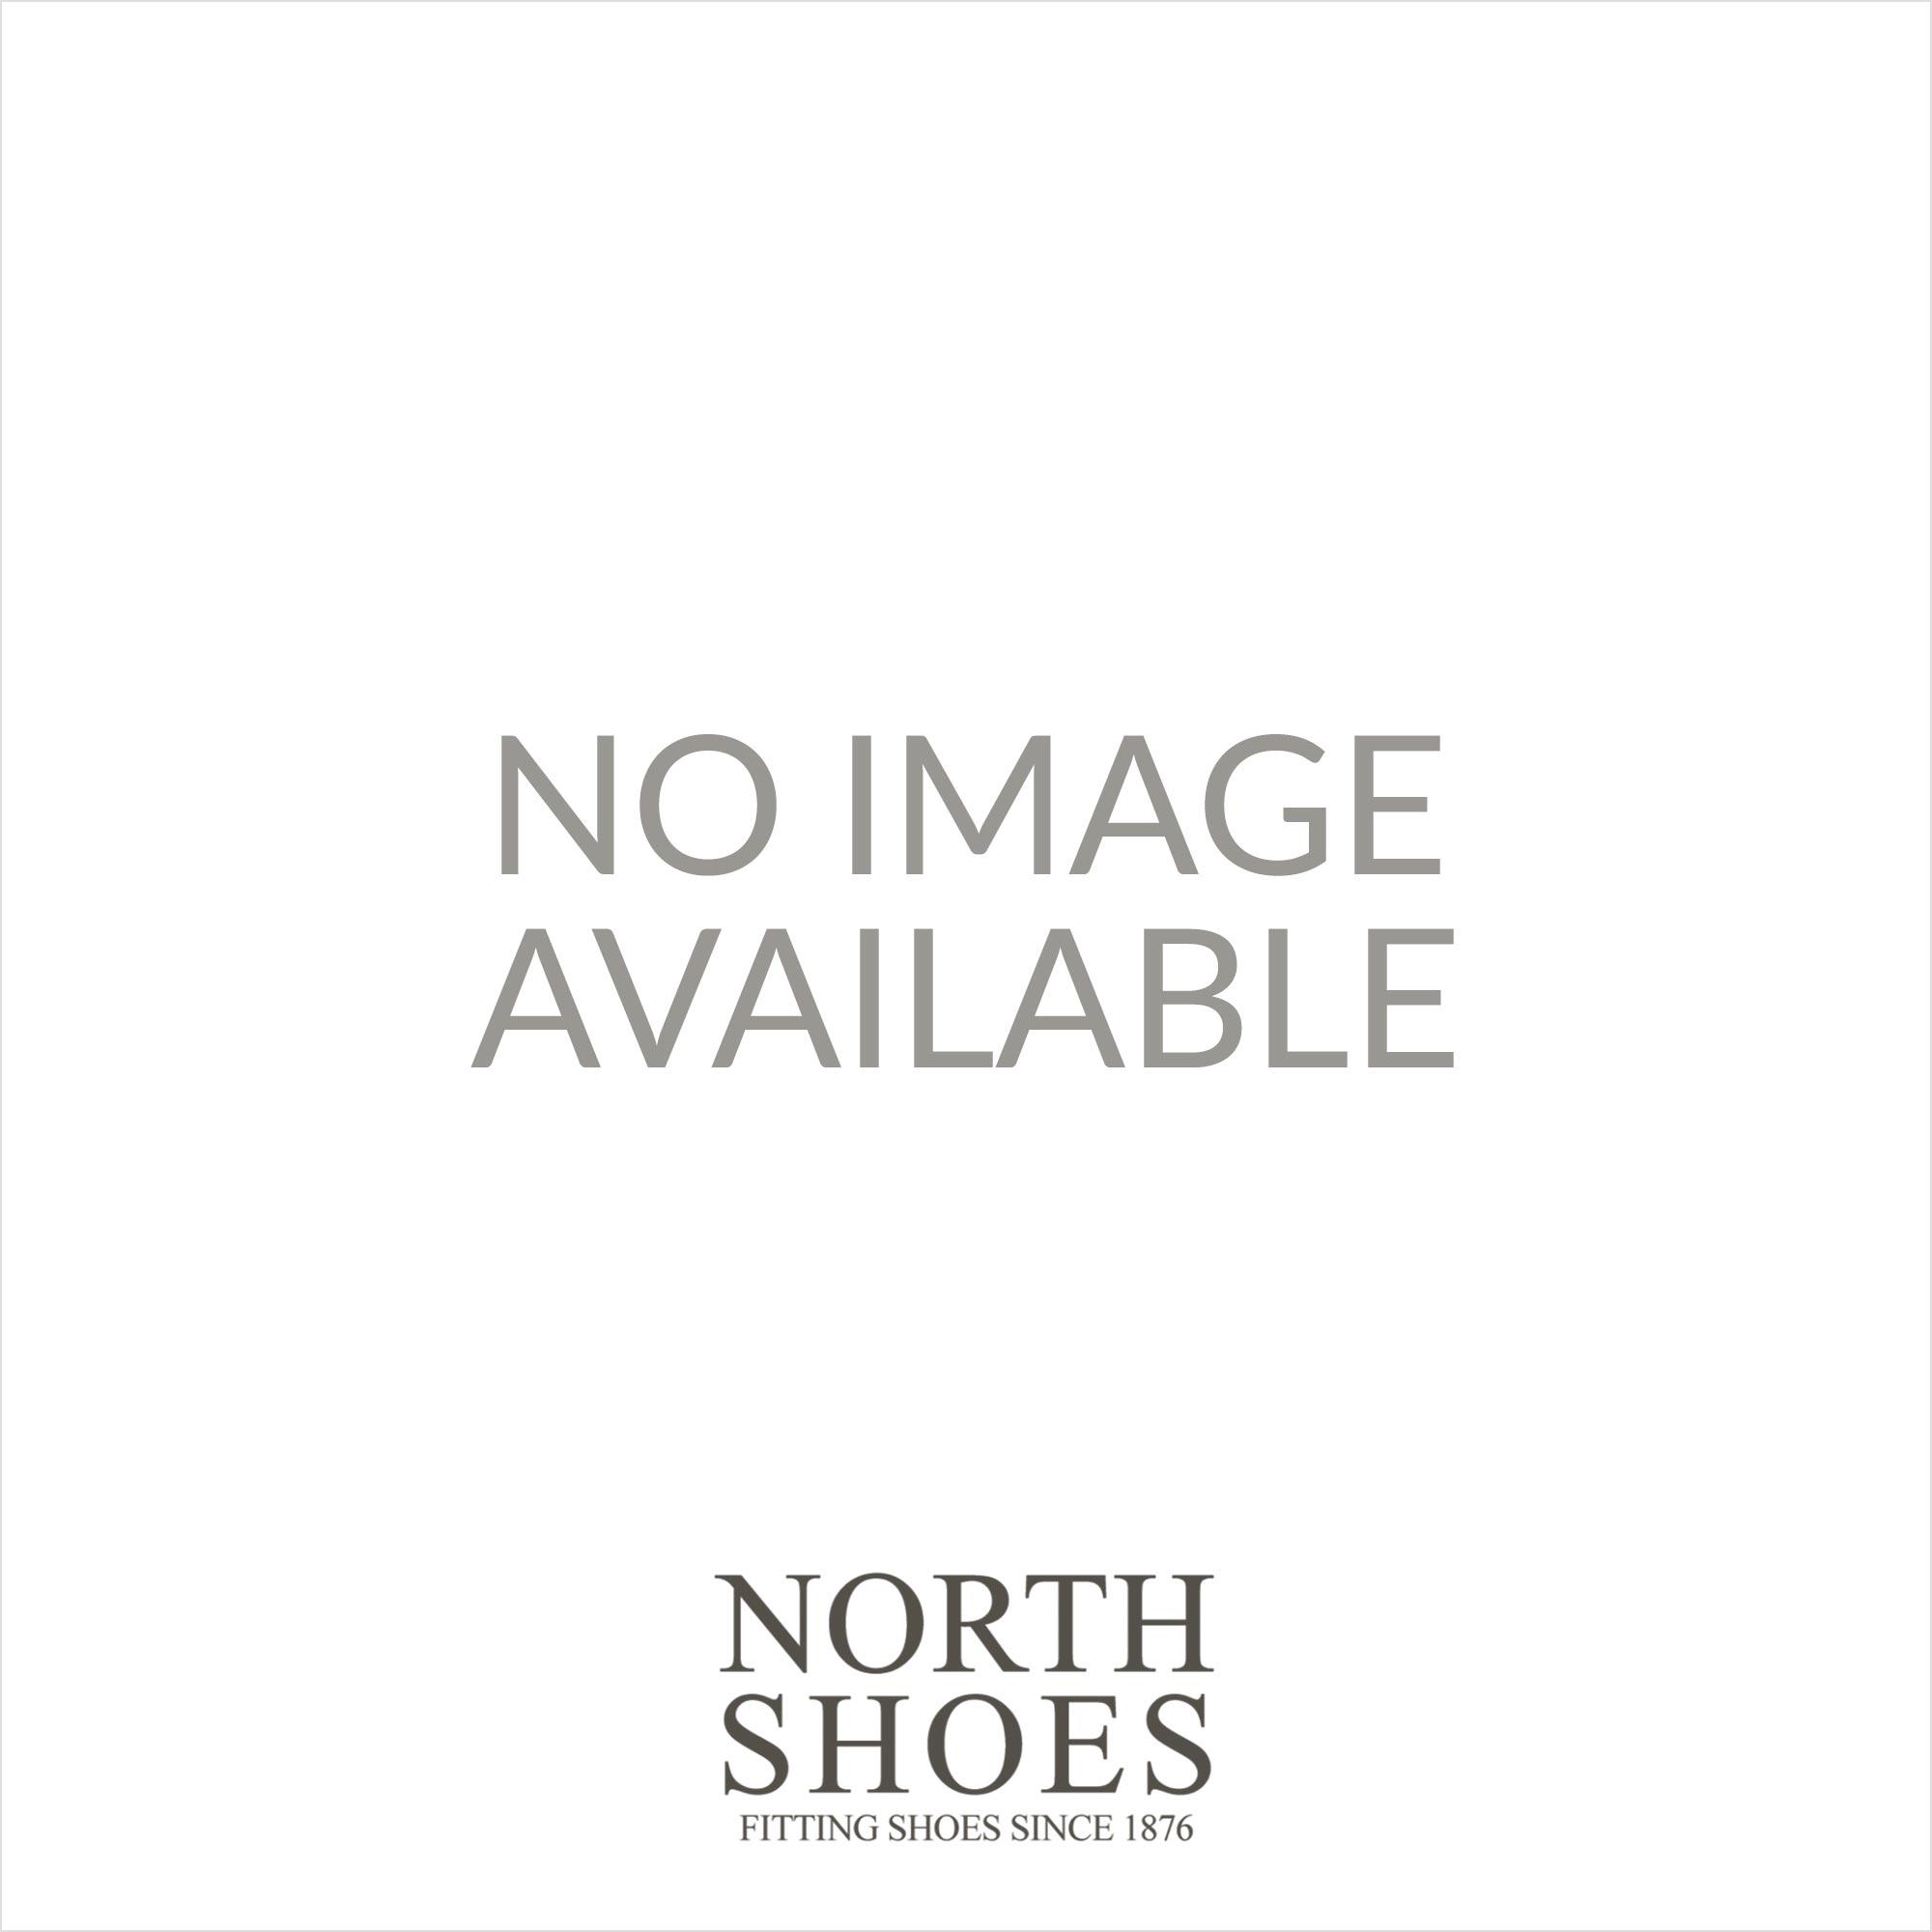 VA3483MI6 Grey Shoe